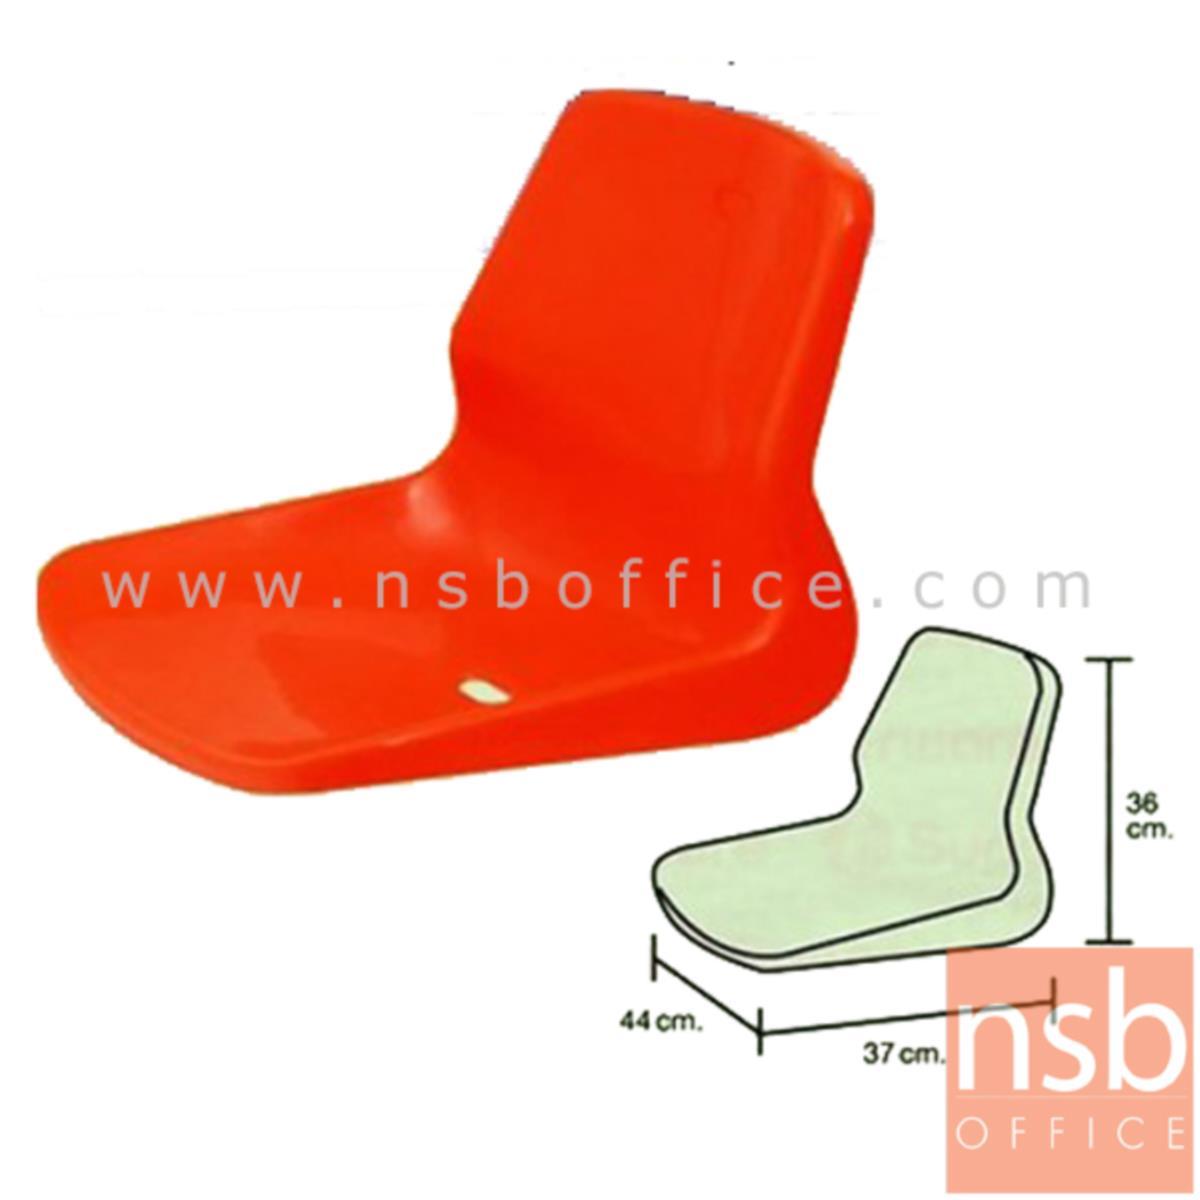 B23A084:เปลือกเก้าอี้พลาสติกโพลี่เต็มตัว   รุ่น Baxter (แบ็กซ์เตอร์)  แบบหนา ( 1 ชิ้น )